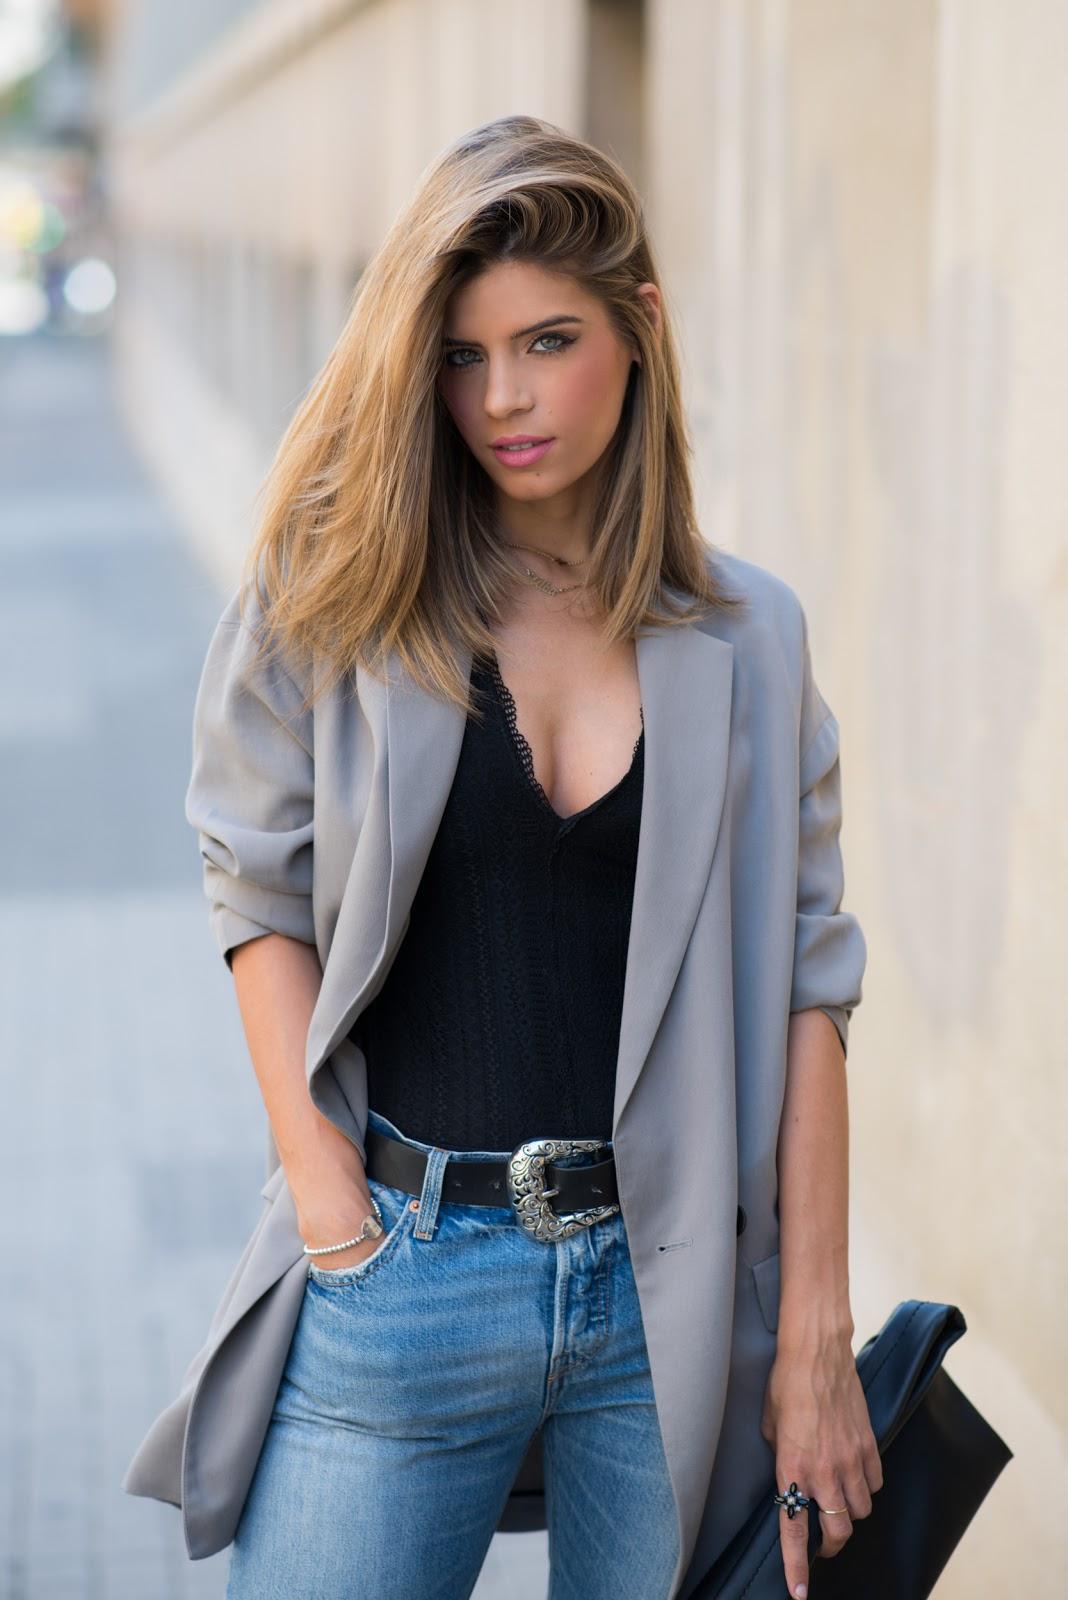 a593515d5c Ms Treinta - Moda y tendencias by Alba Zapater. - Fashion Blogger ...